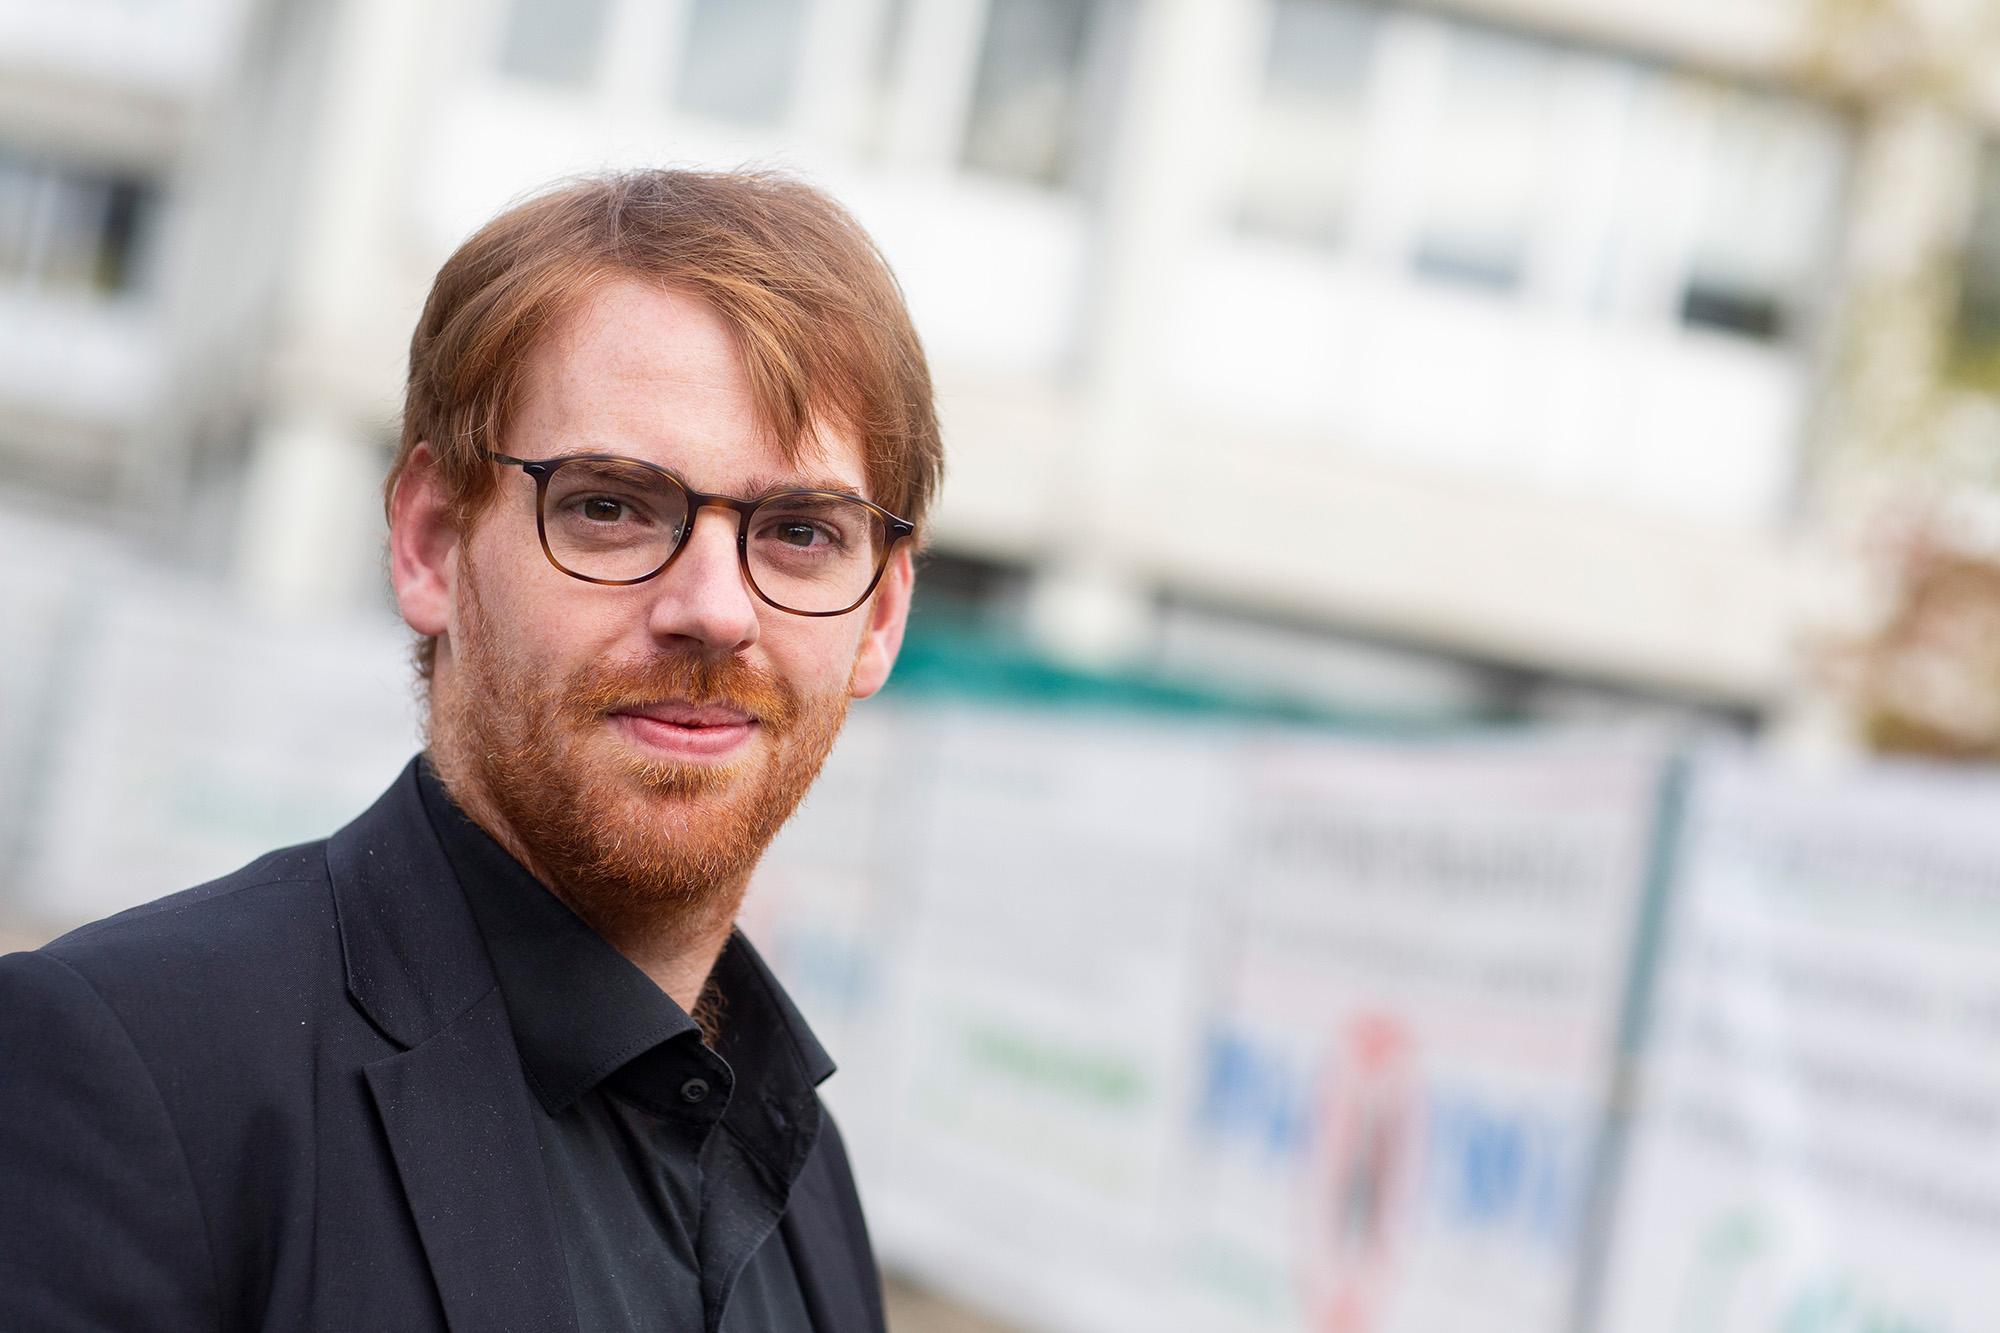 Dr. Sebastian Kurtenbach